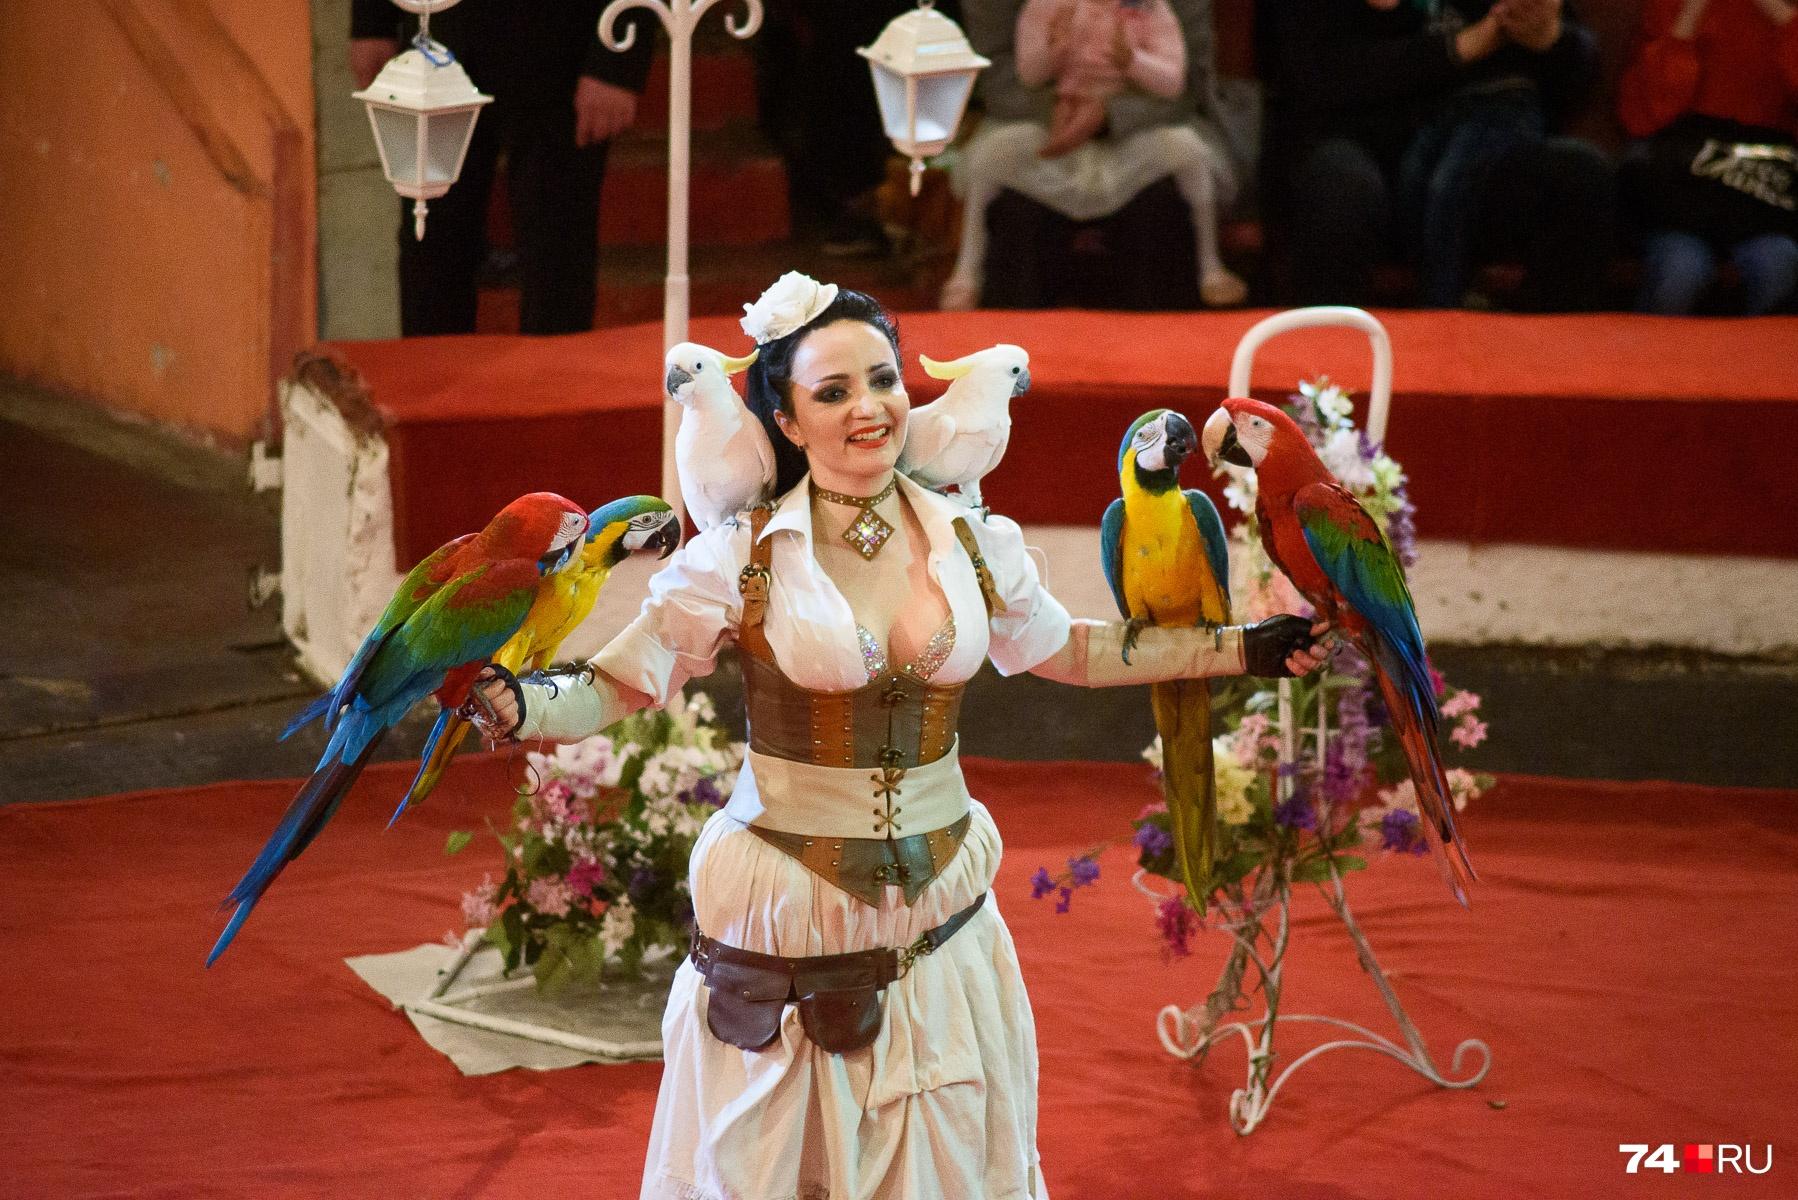 И её же подопечные —попугаи Ара, Какаду